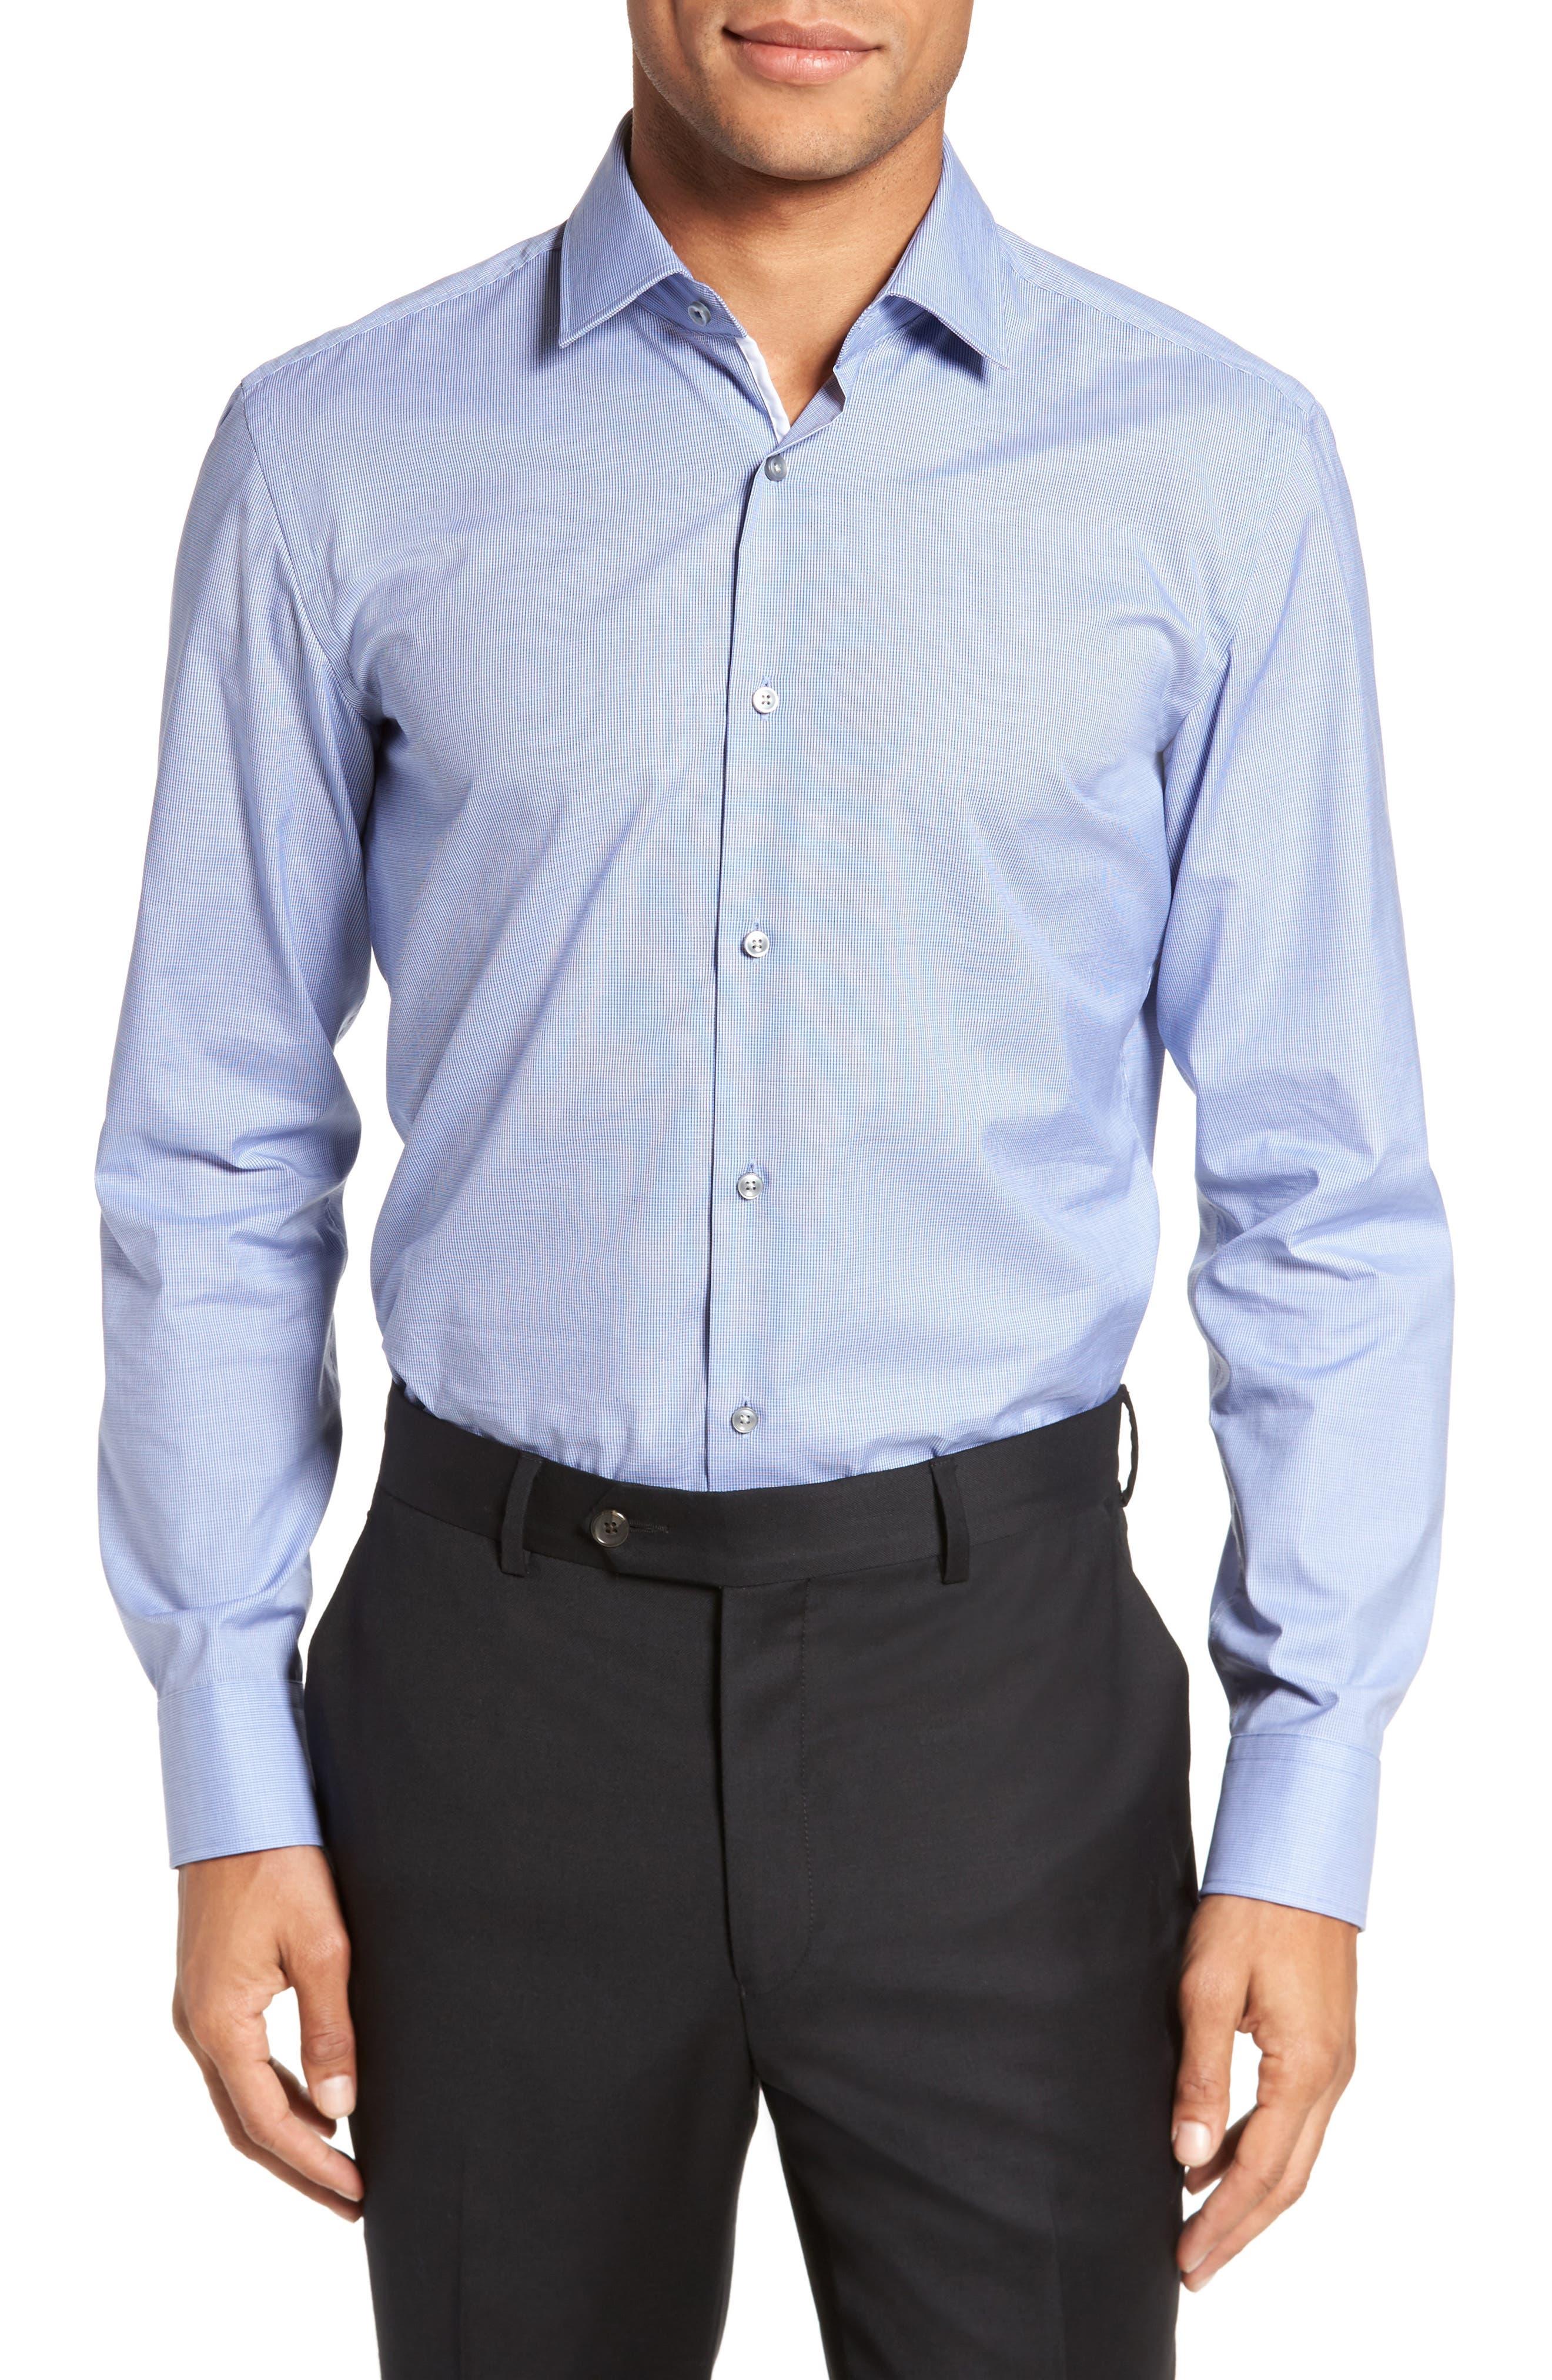 Main Image - BOSS Jerris Slim Fit Easy Iron Check Dress Shirt